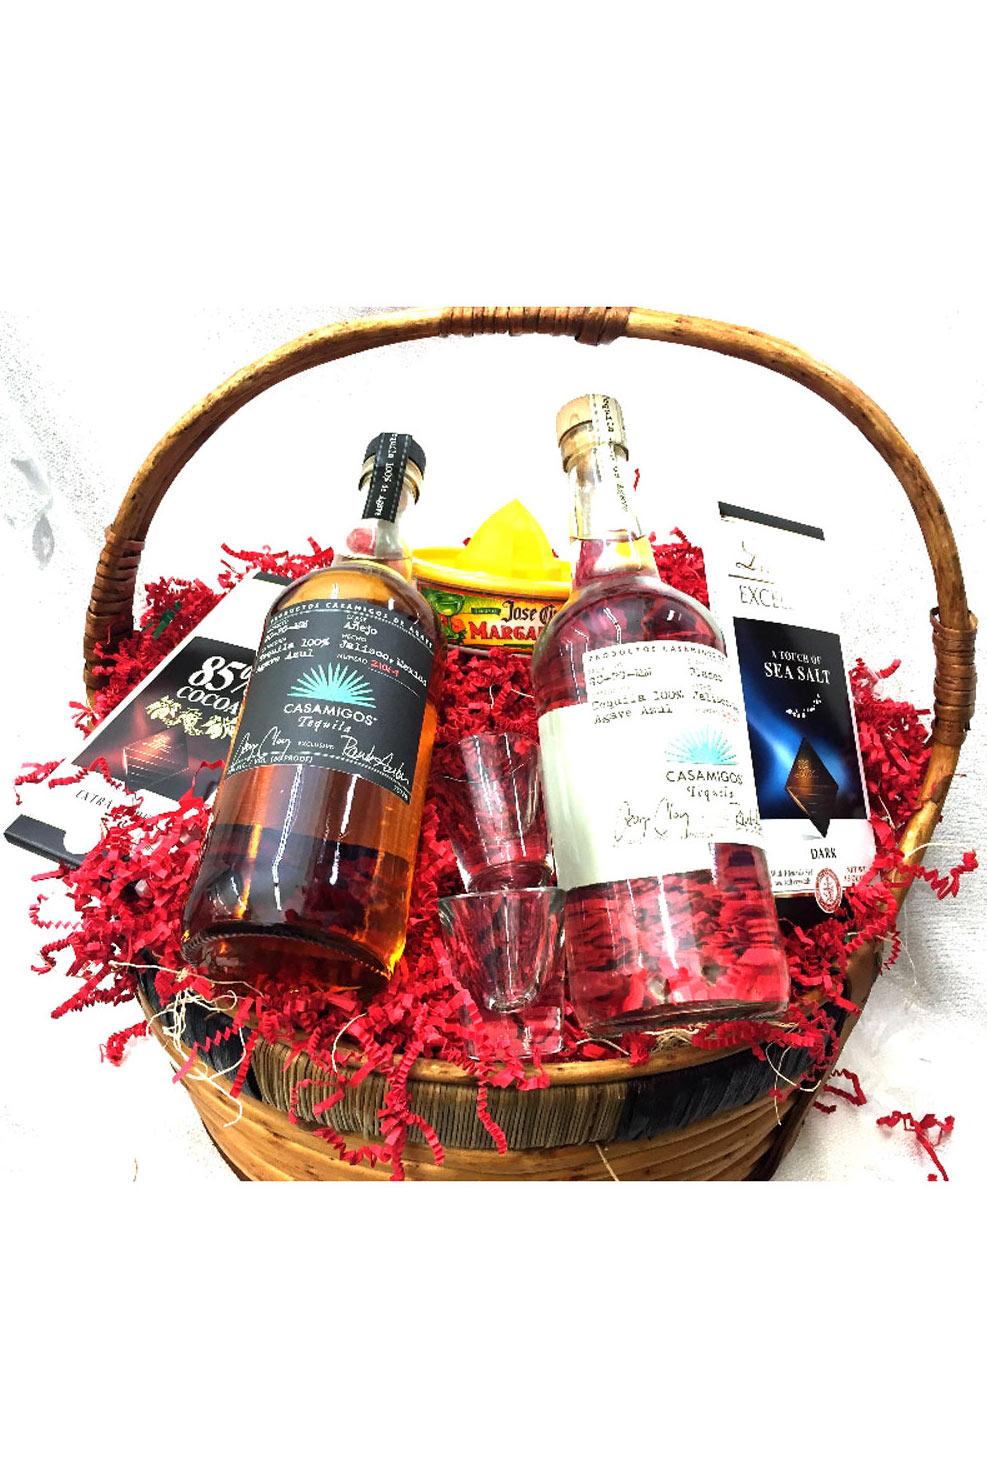 Cognac Gift Baskets Casamigos Tequila Basket Call 323 655 9995